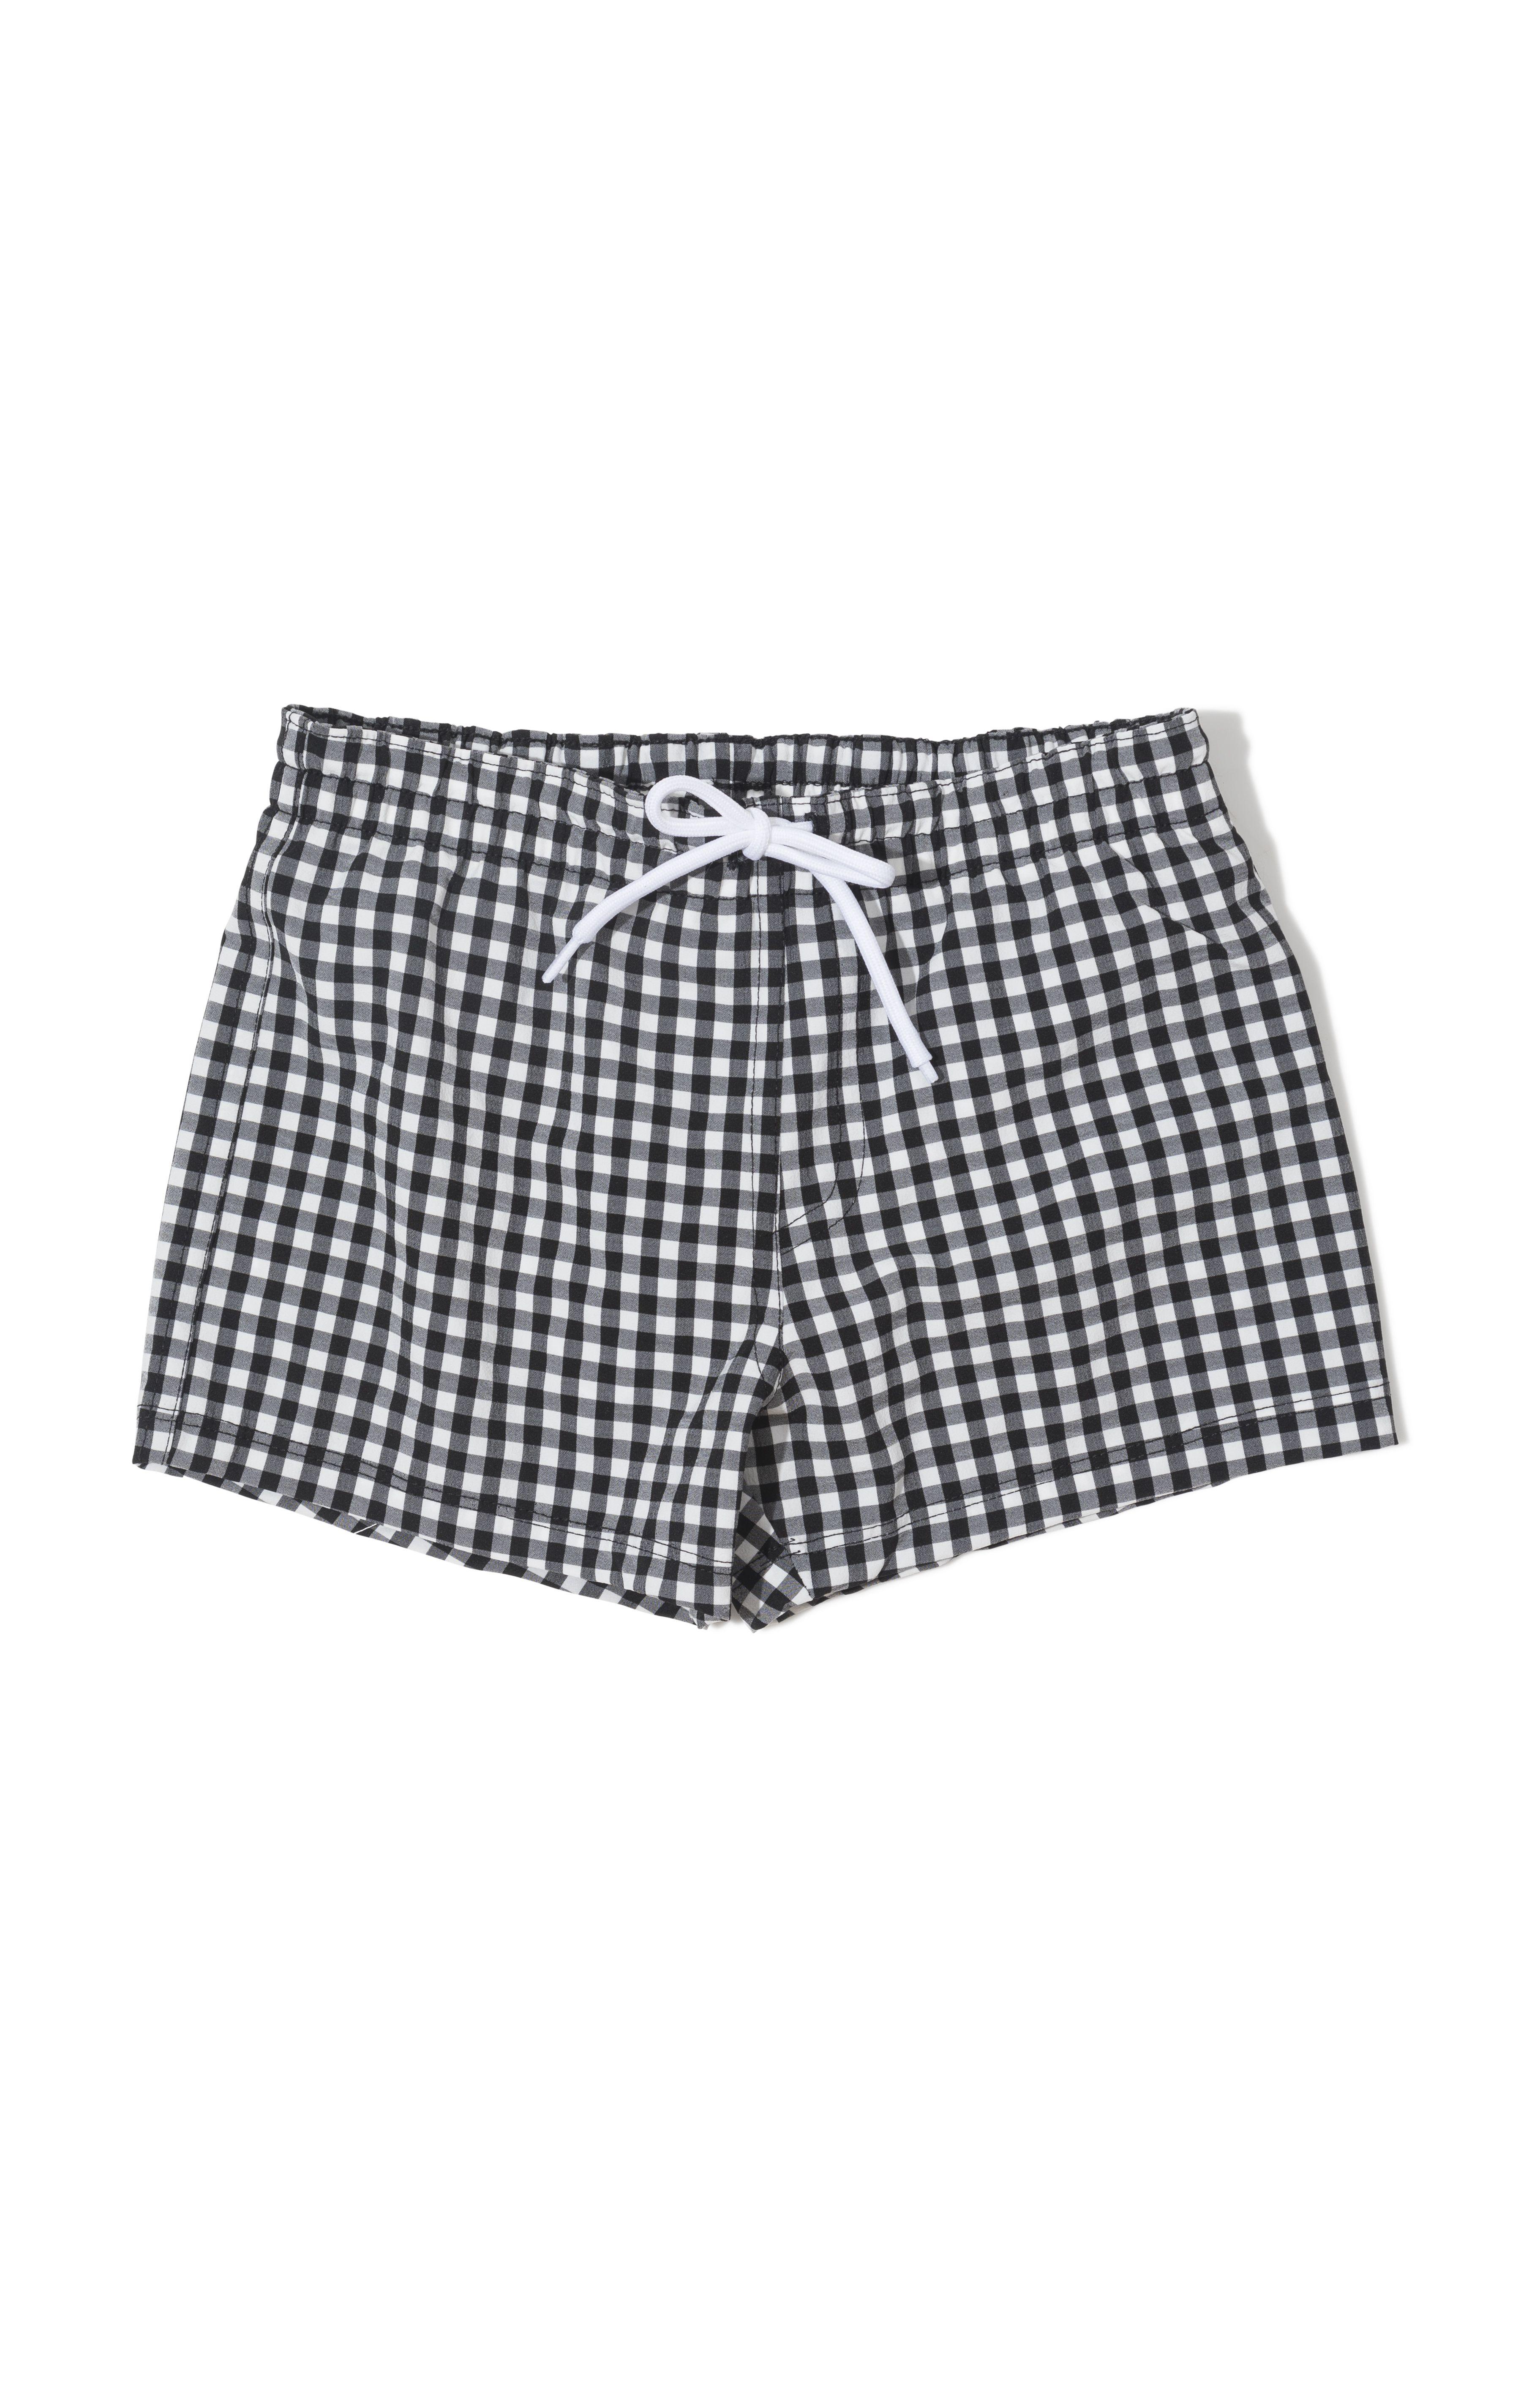 83ea657d6f Classic Black Gingham Boy's Swim Shorts | Baby Girl Swim 2019 | Swim ...